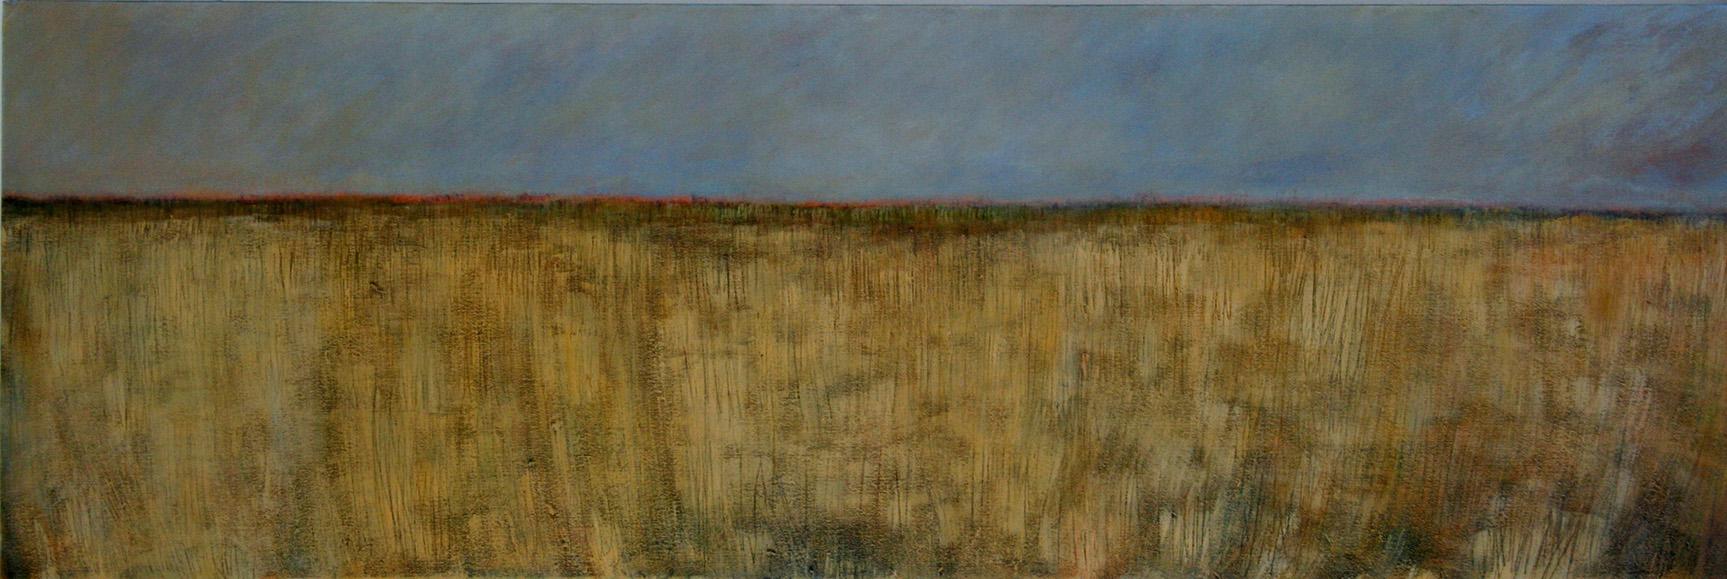 Okavango, 2009. Acrílico sobre lienzo. 50 x 126 cm